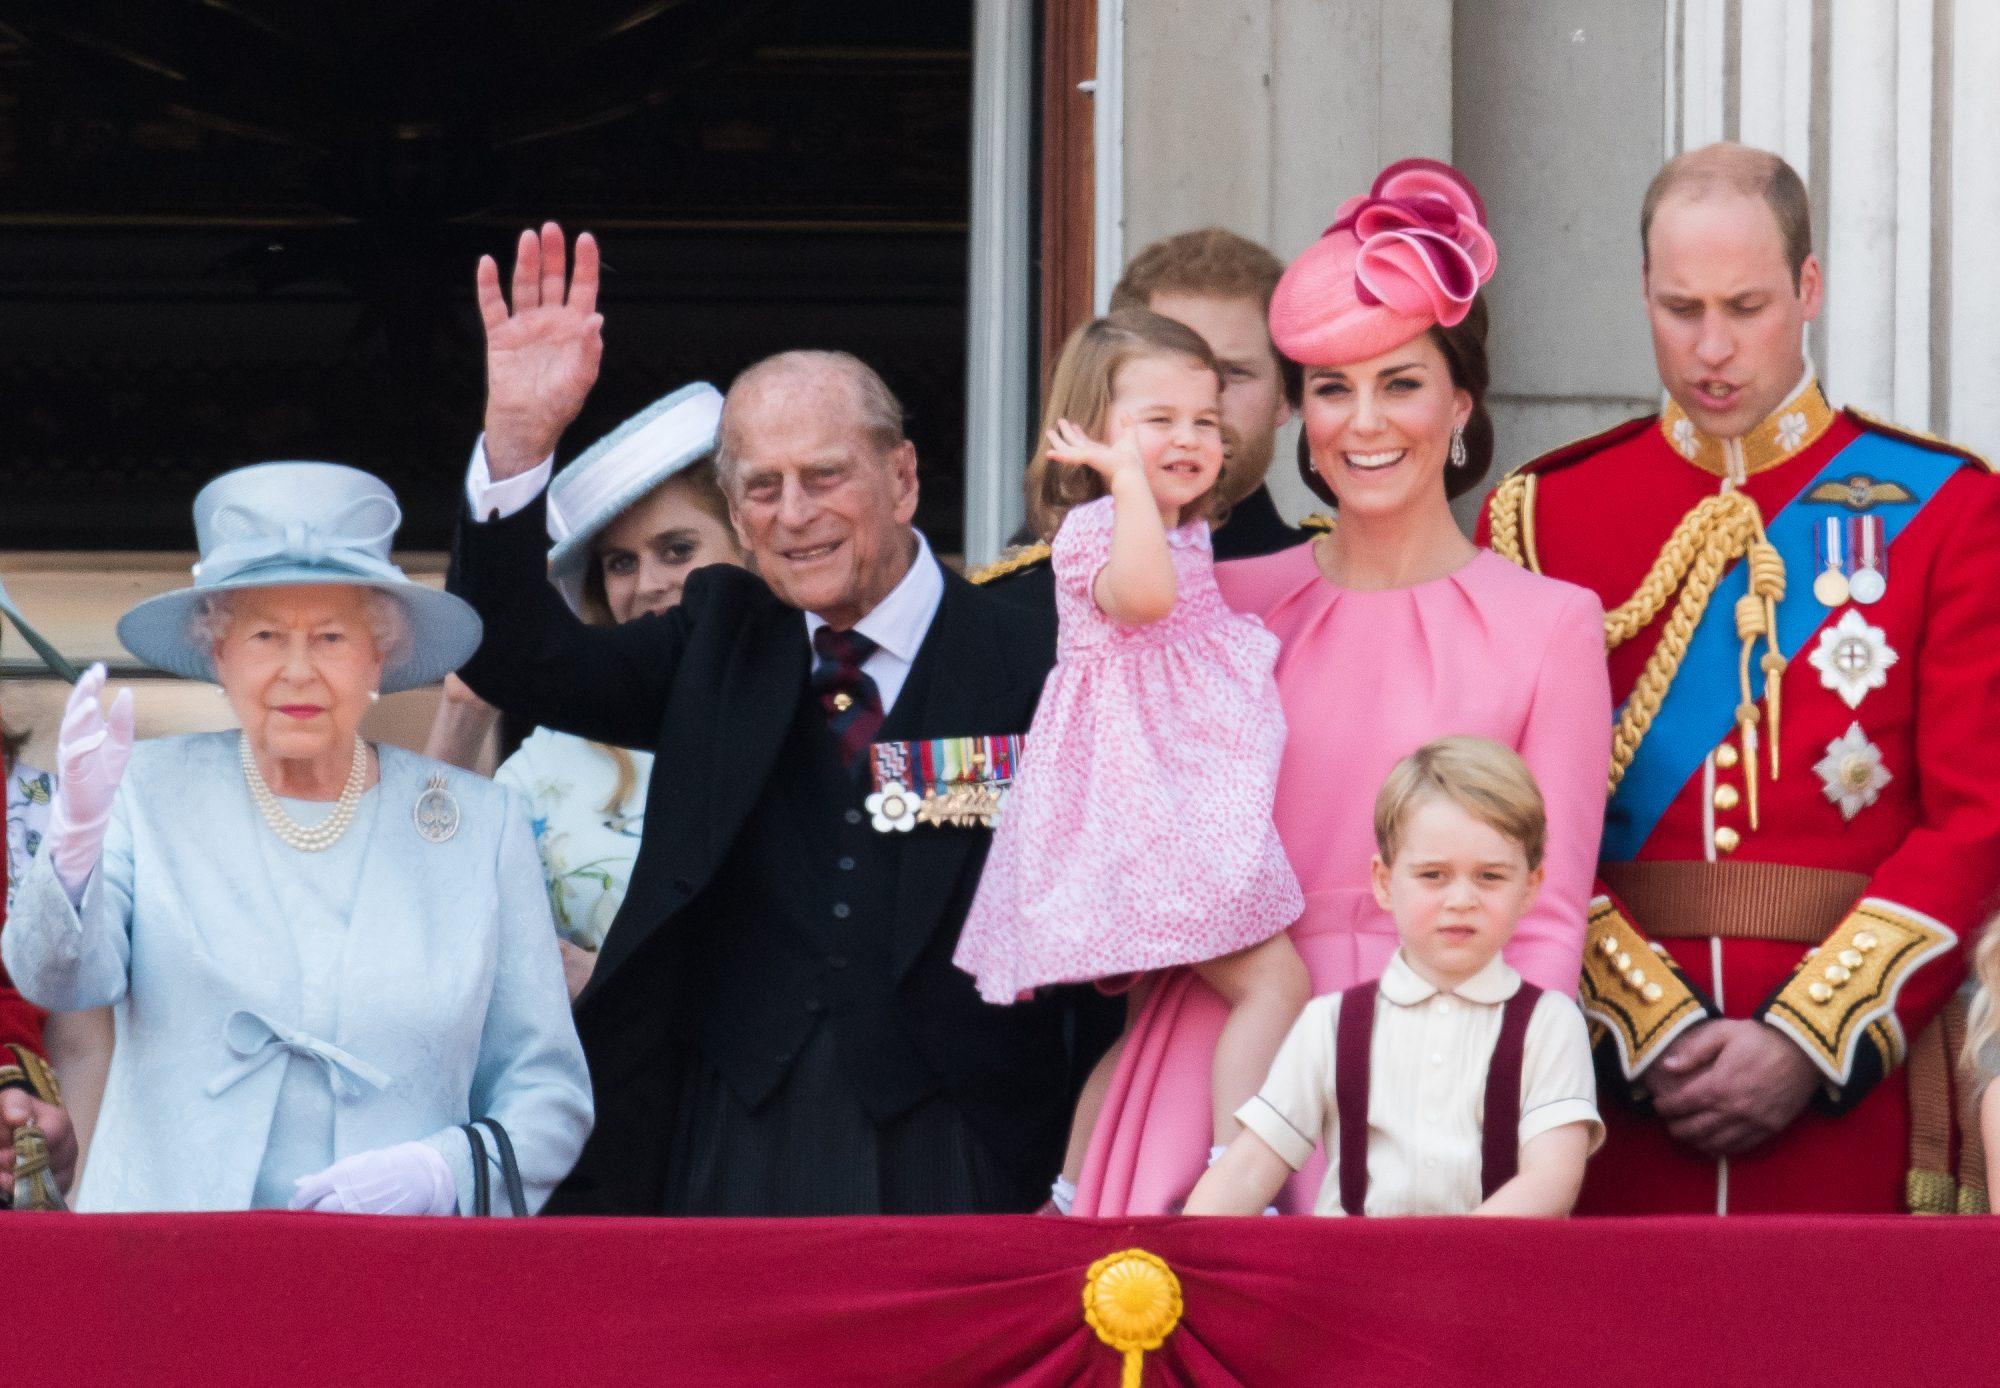 Queen Elizabeth II, Prince Philip, Prince George, Prince William, Princess Charlotte, Kate Middleton